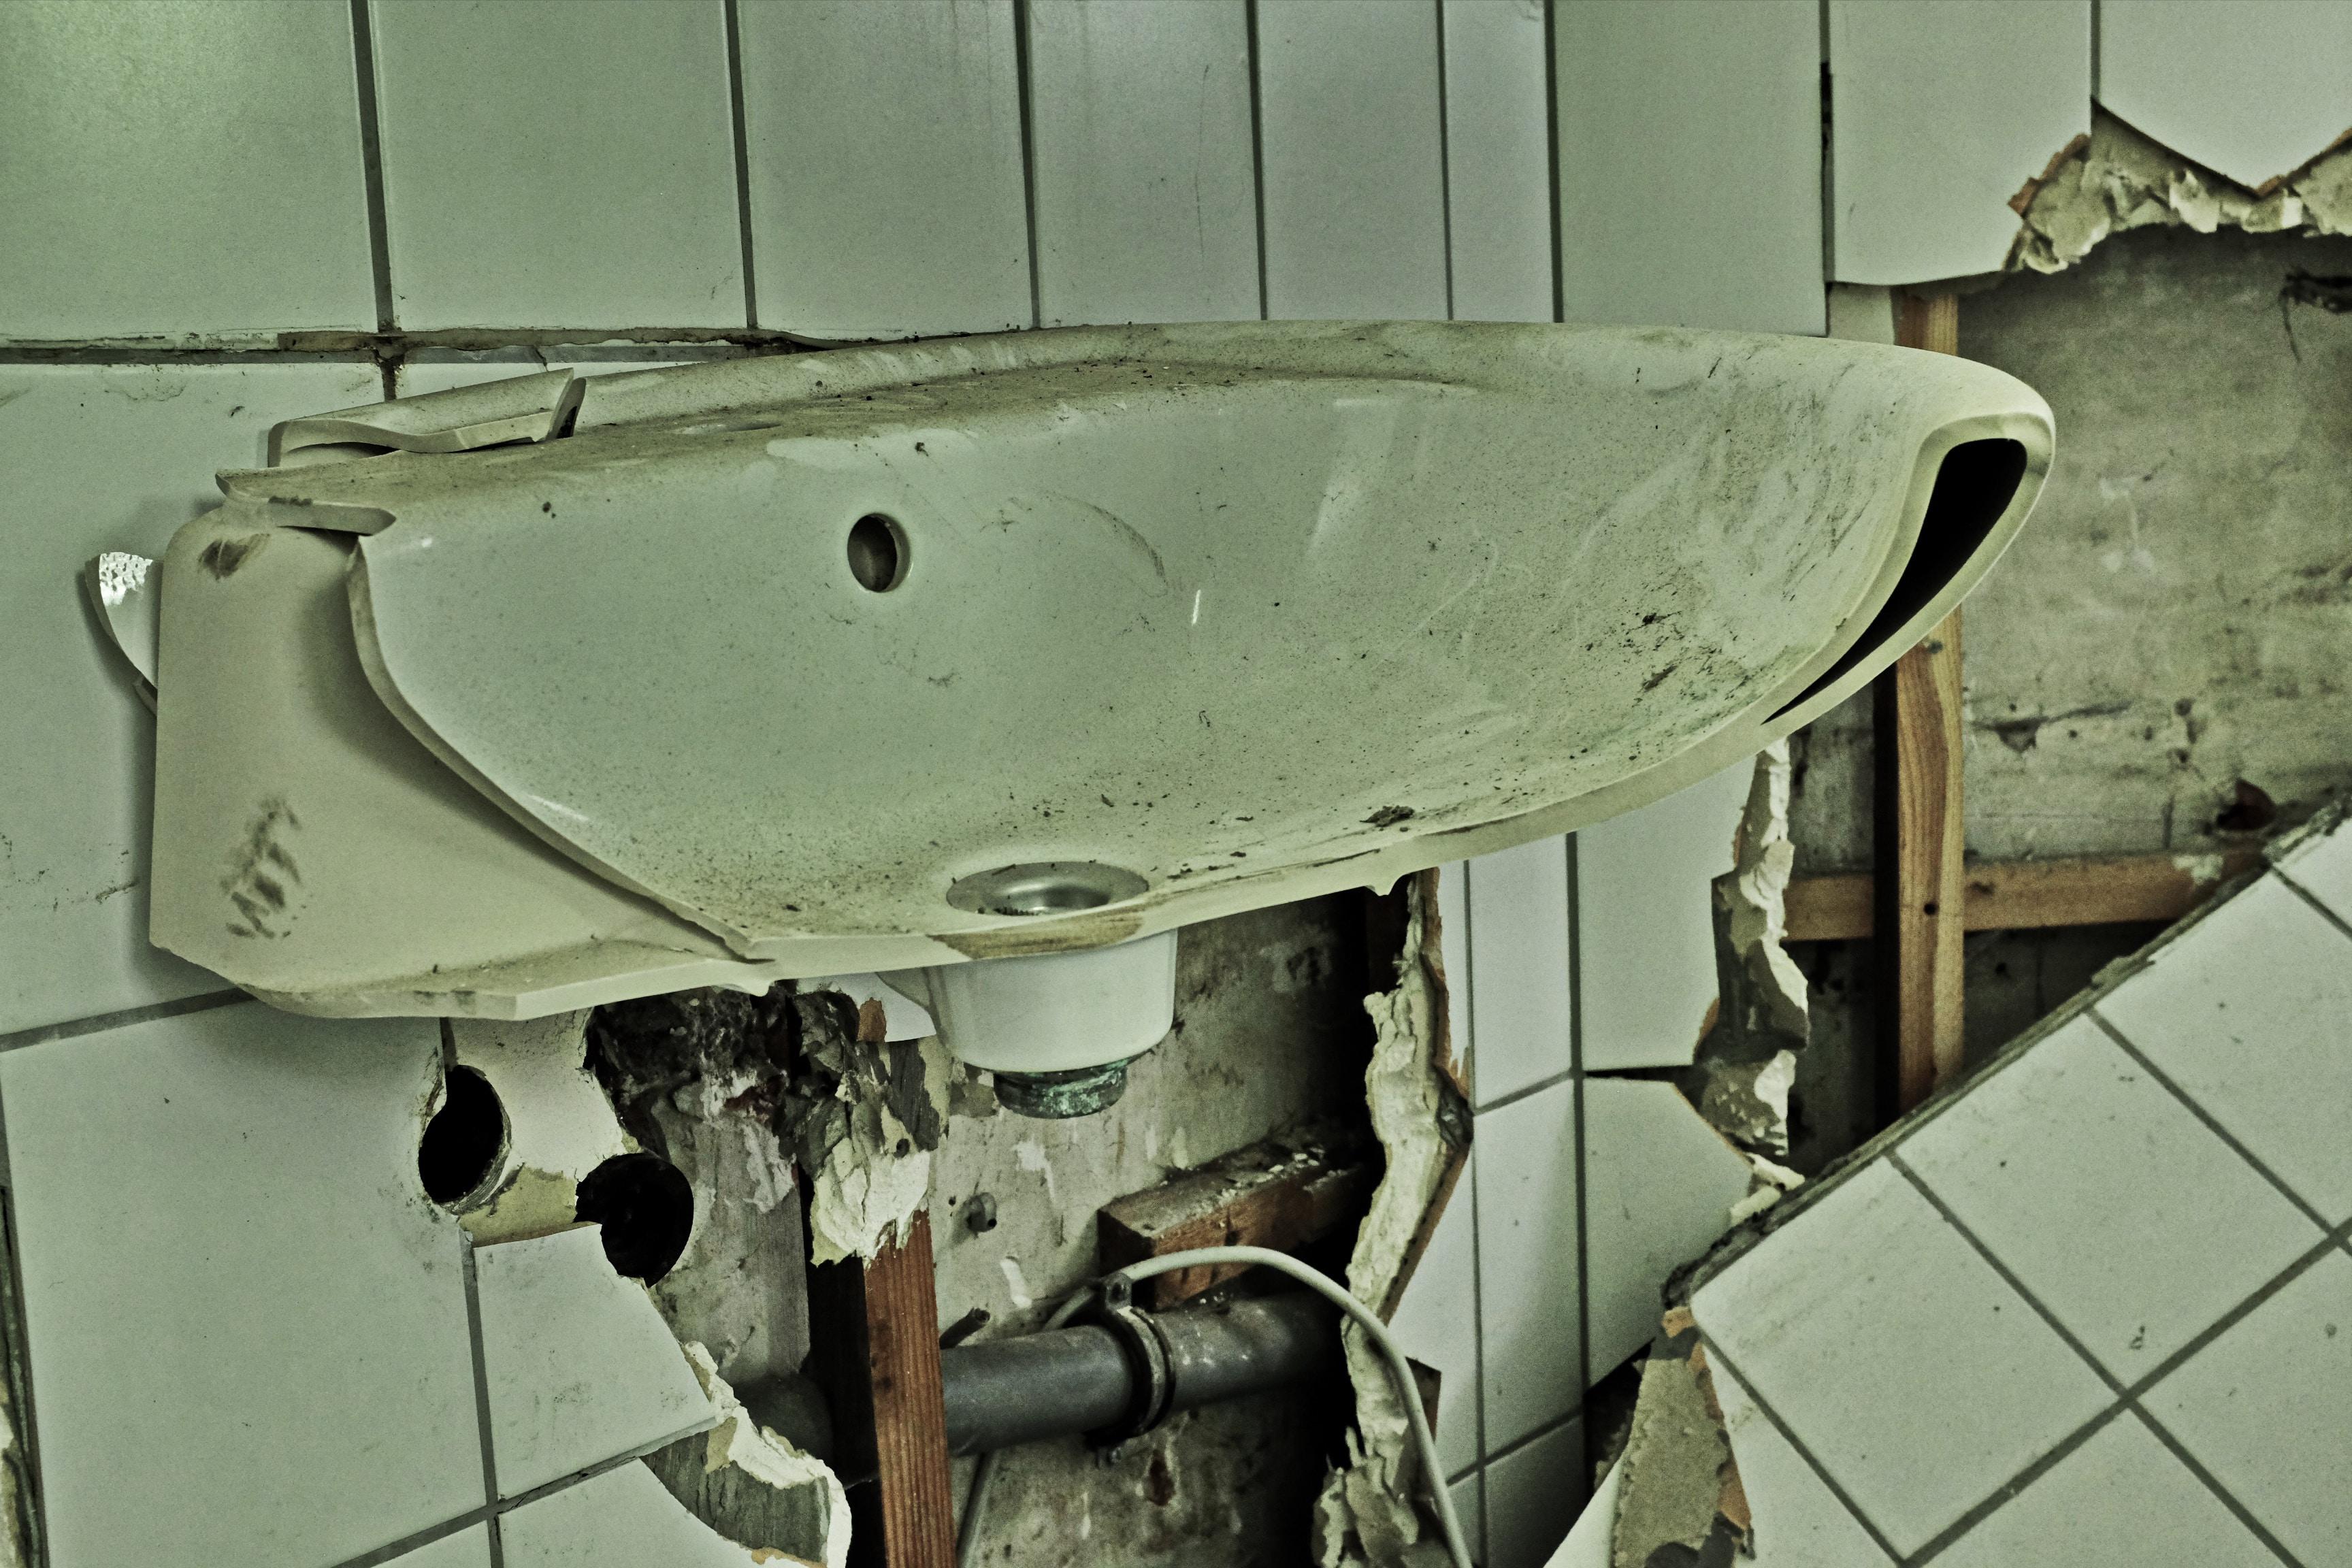 A broken apart bathroom sink vanity and wall.